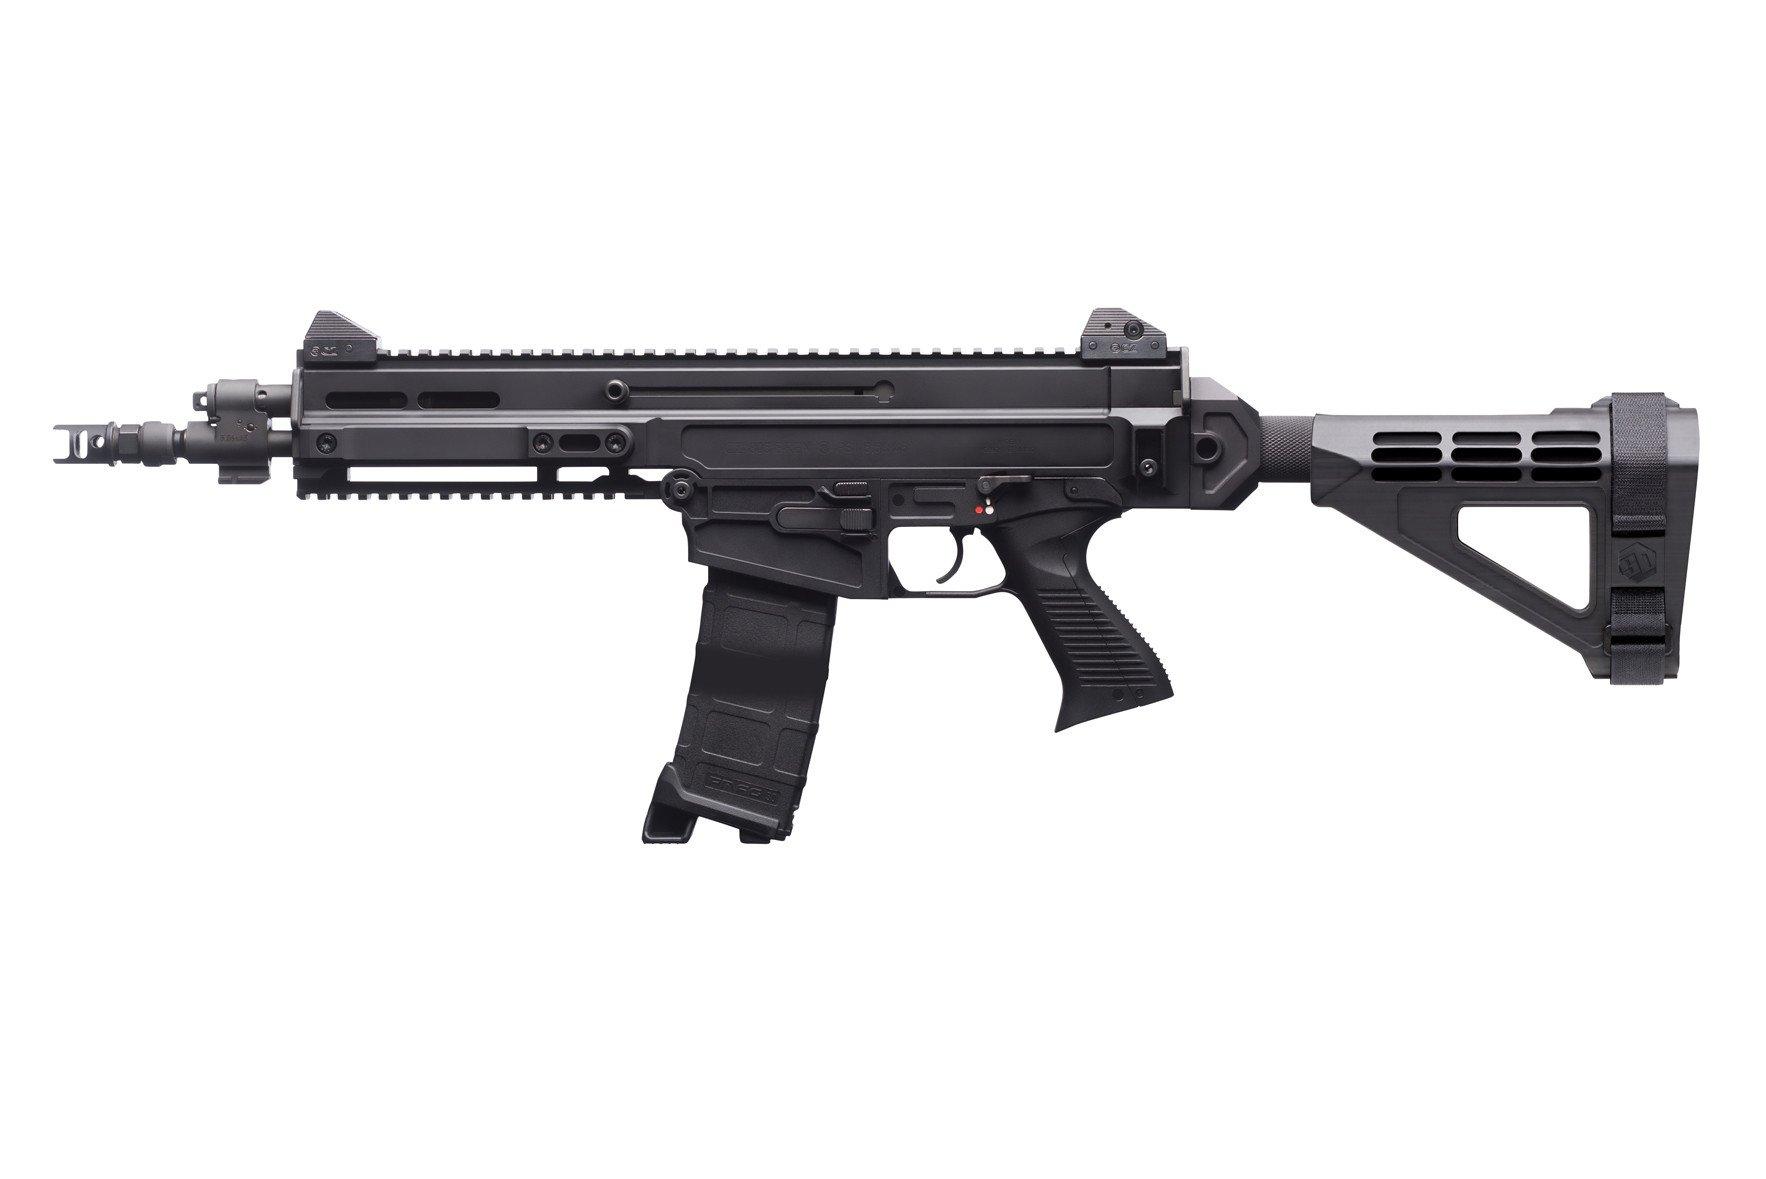 SB Tactical SBM4 Pistol Stabilizing Brace (Options)